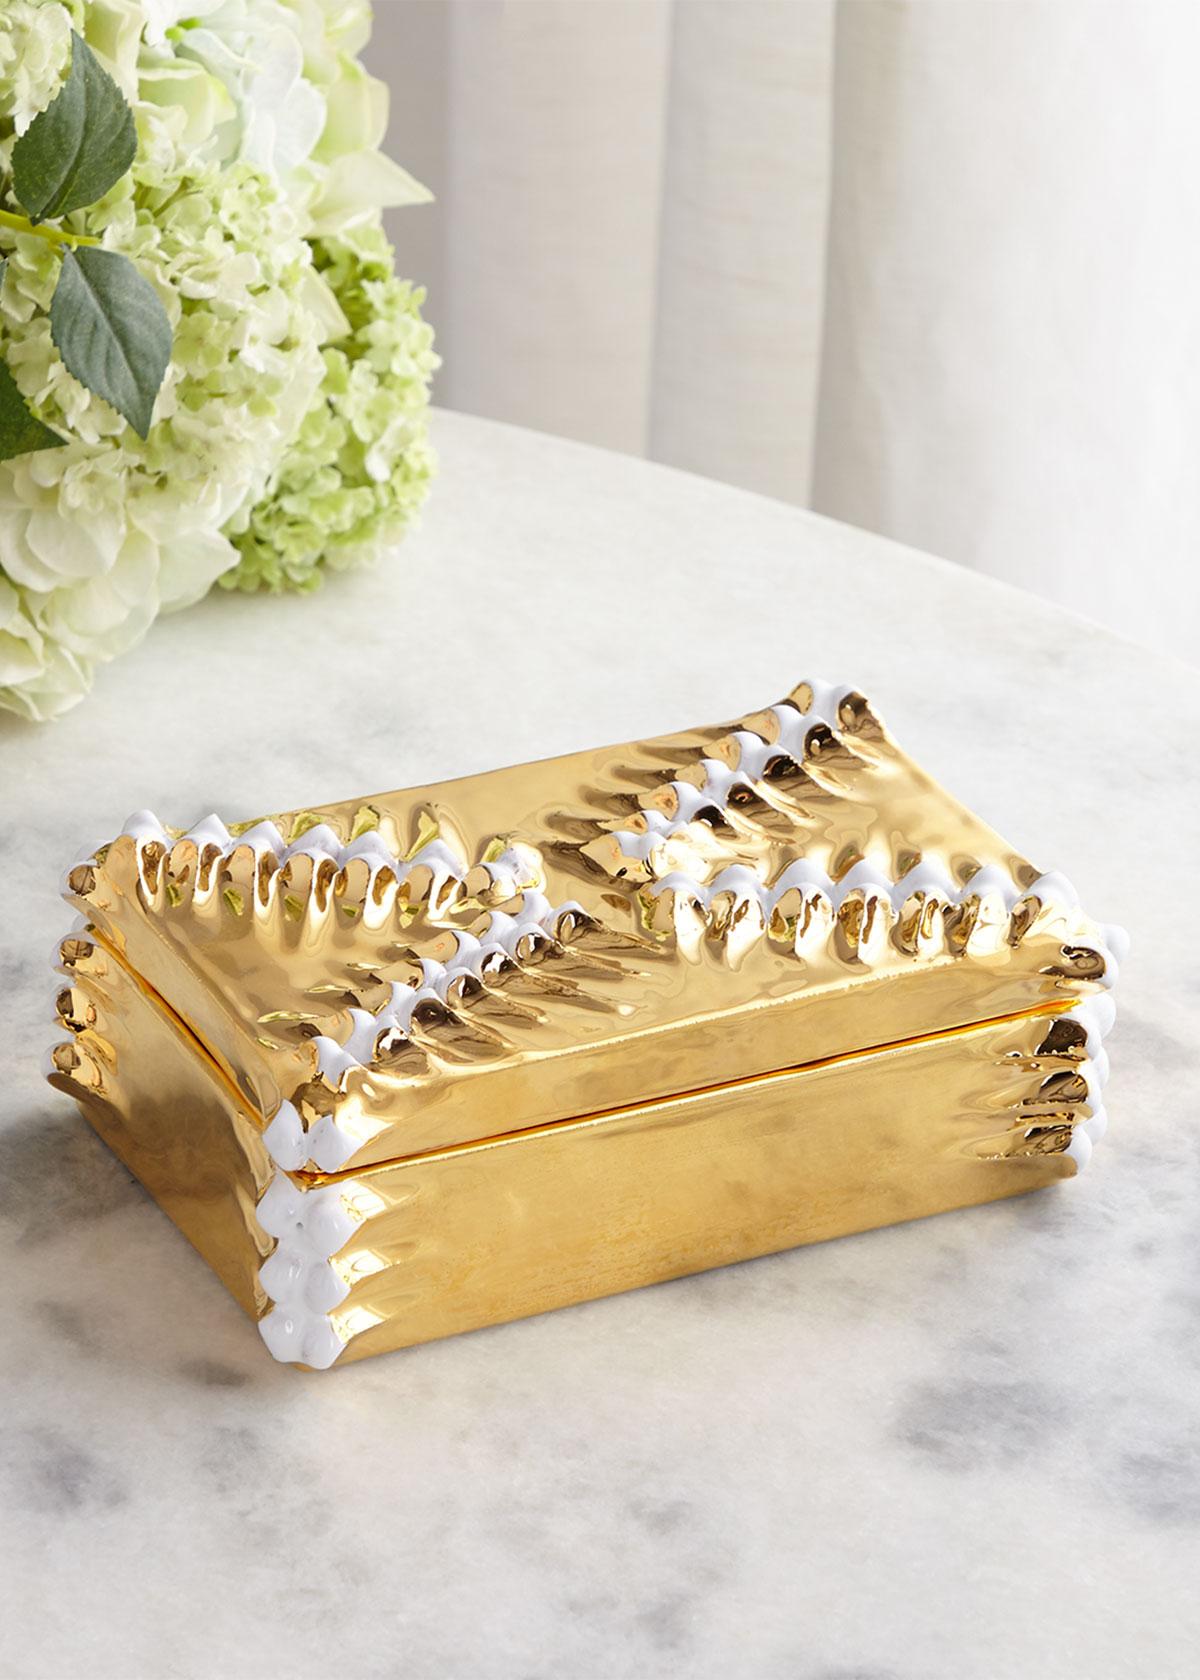 Dolfi GOLDEN BOX WITH WHITE PINE CONE STRIPS